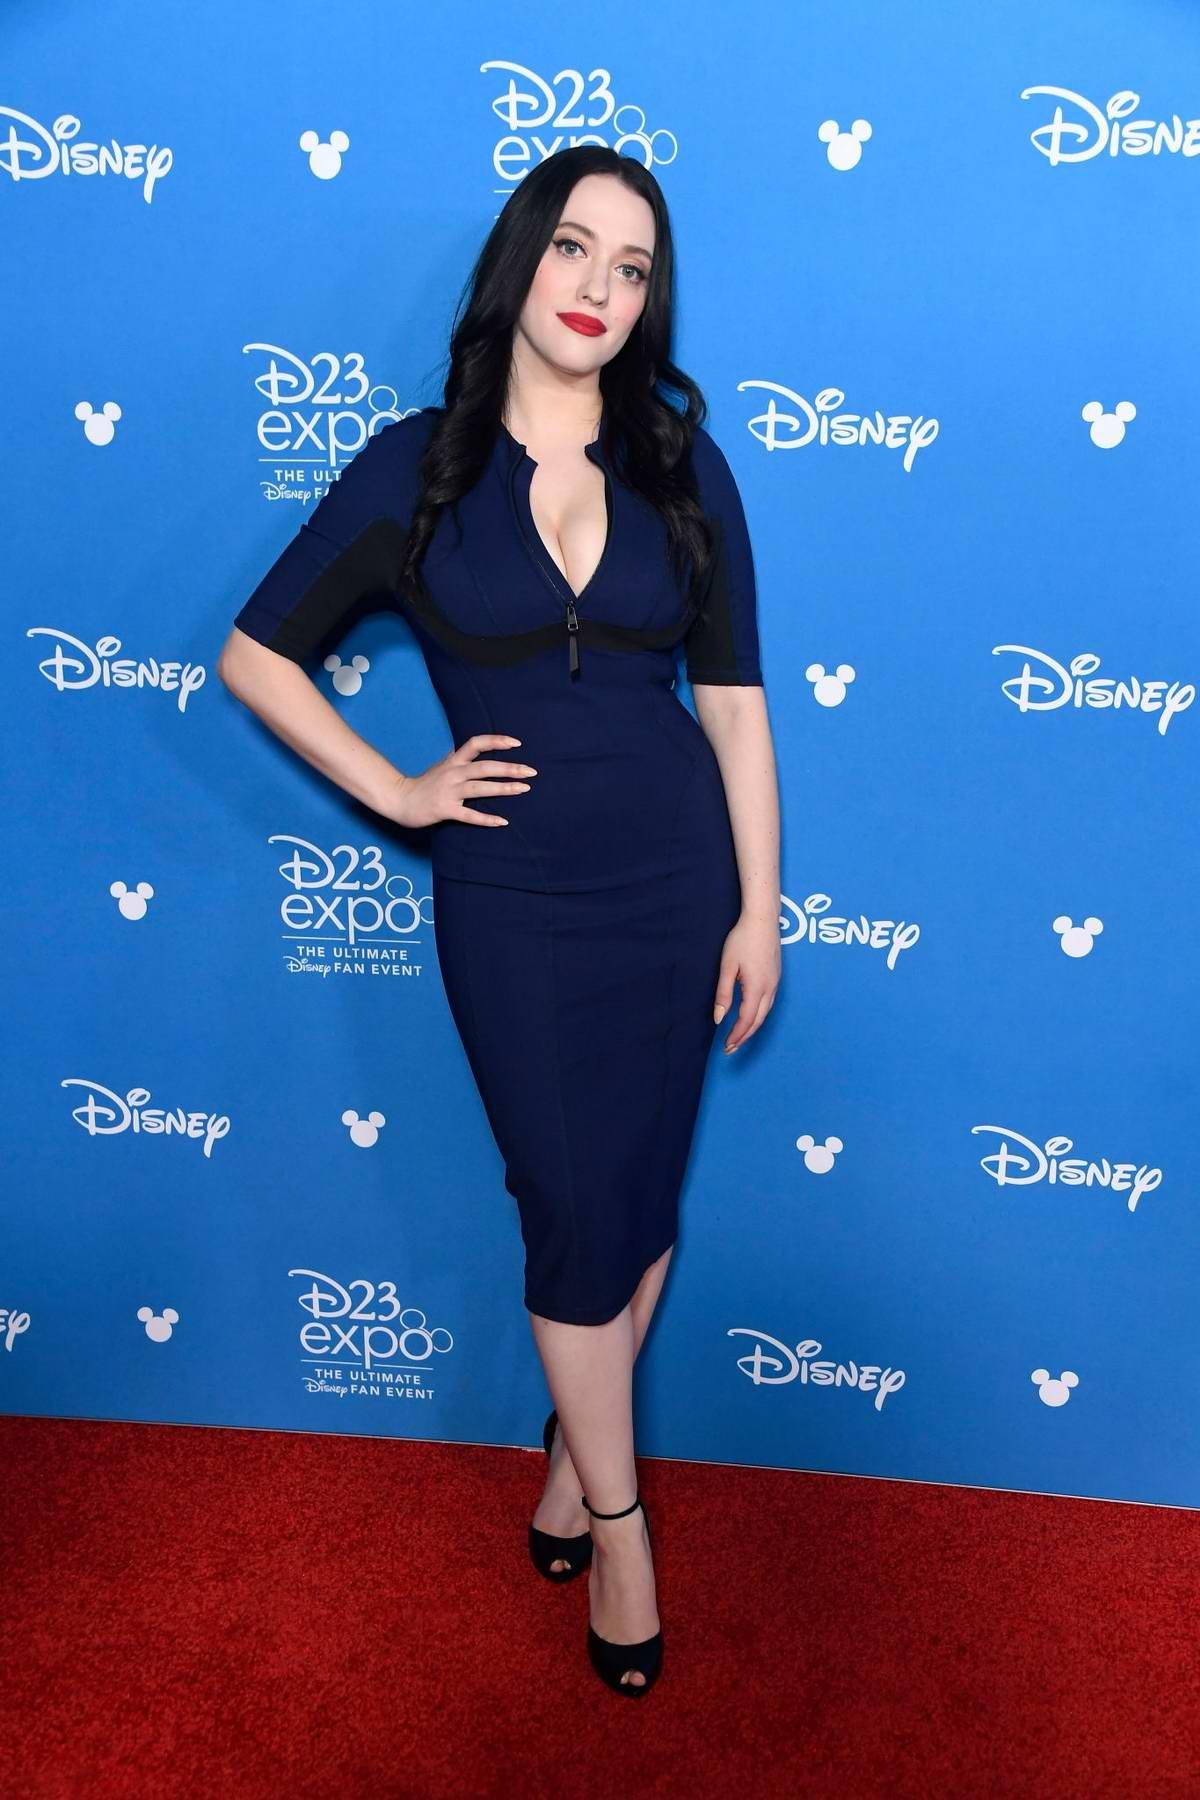 Kat Dennings attends Disney D23 Expo 2019 at Anaheim Convention Center in Anaheim, California